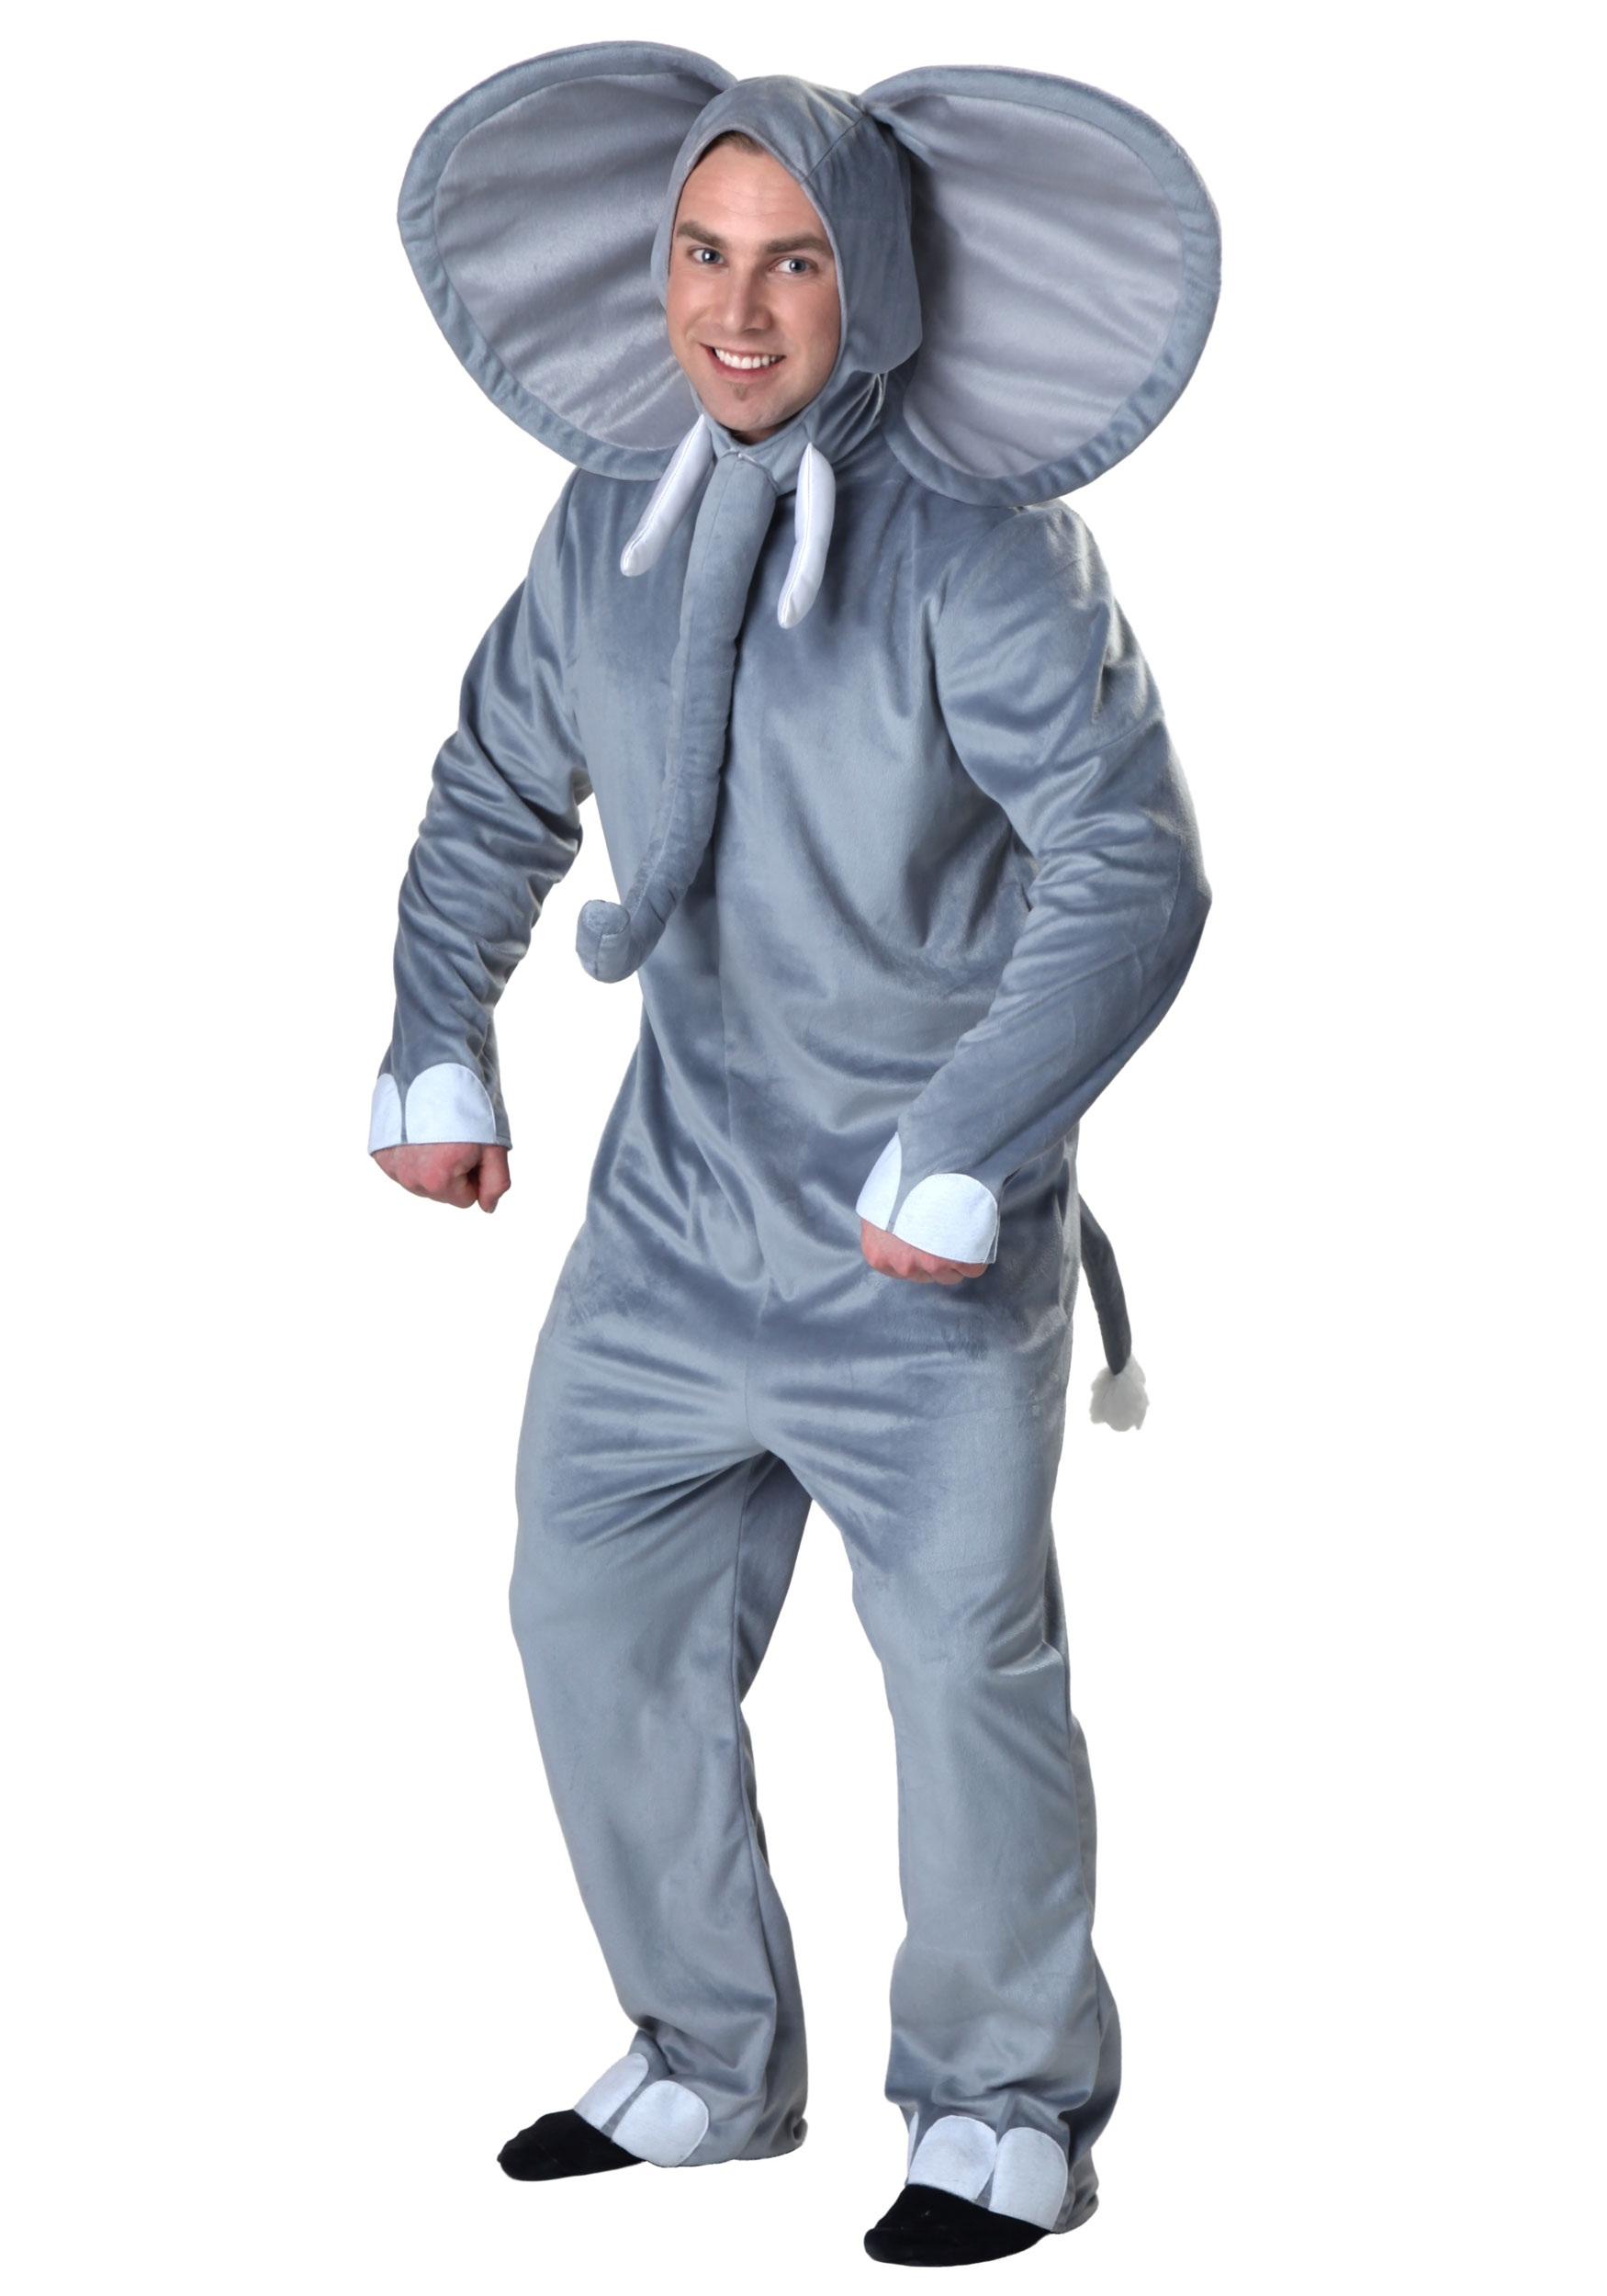 Costume Adult 97